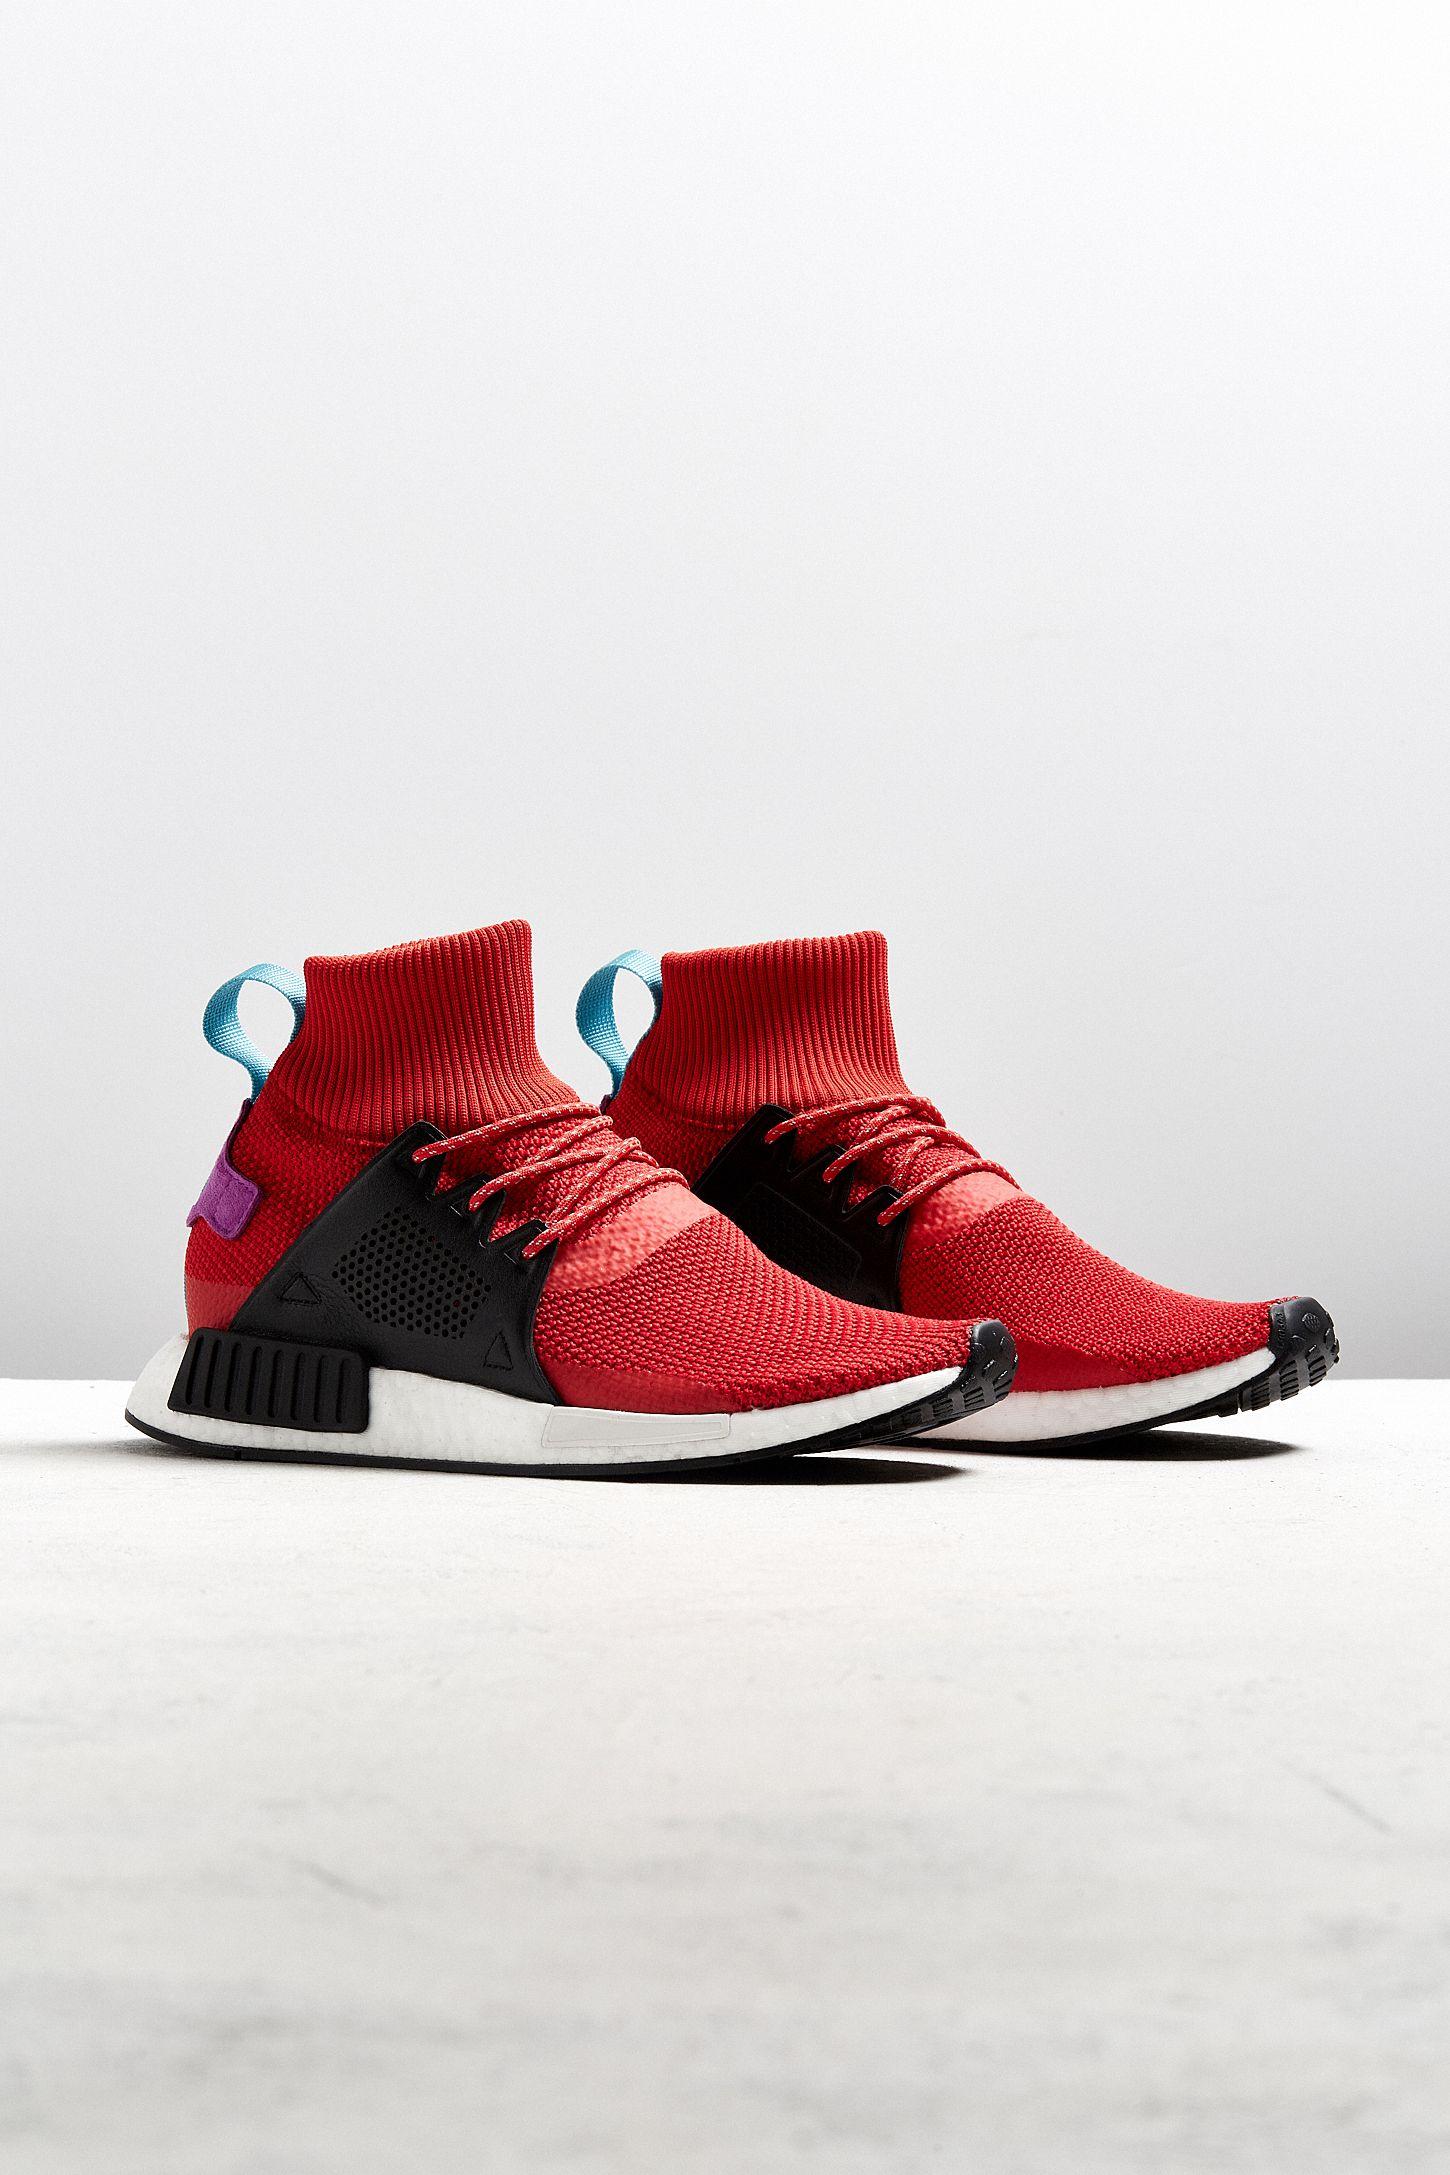 67628052d1caa adidas NMD XR1 Winter Primeknit Sneaker